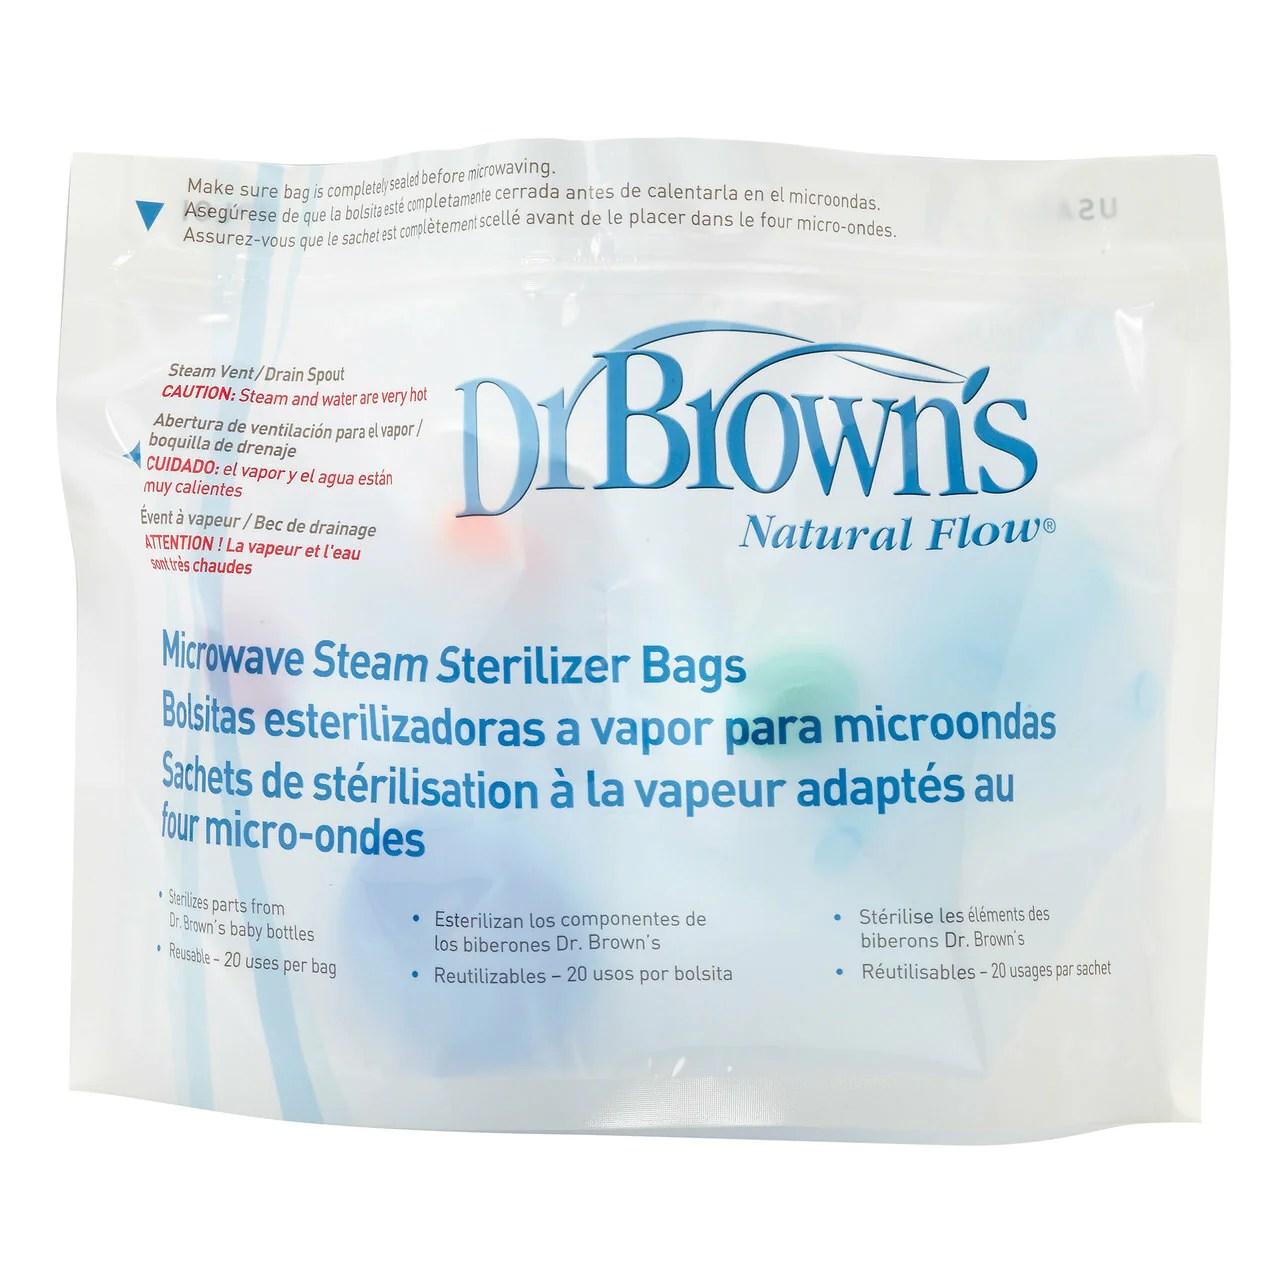 dr browns options bags microwave steriliser bags